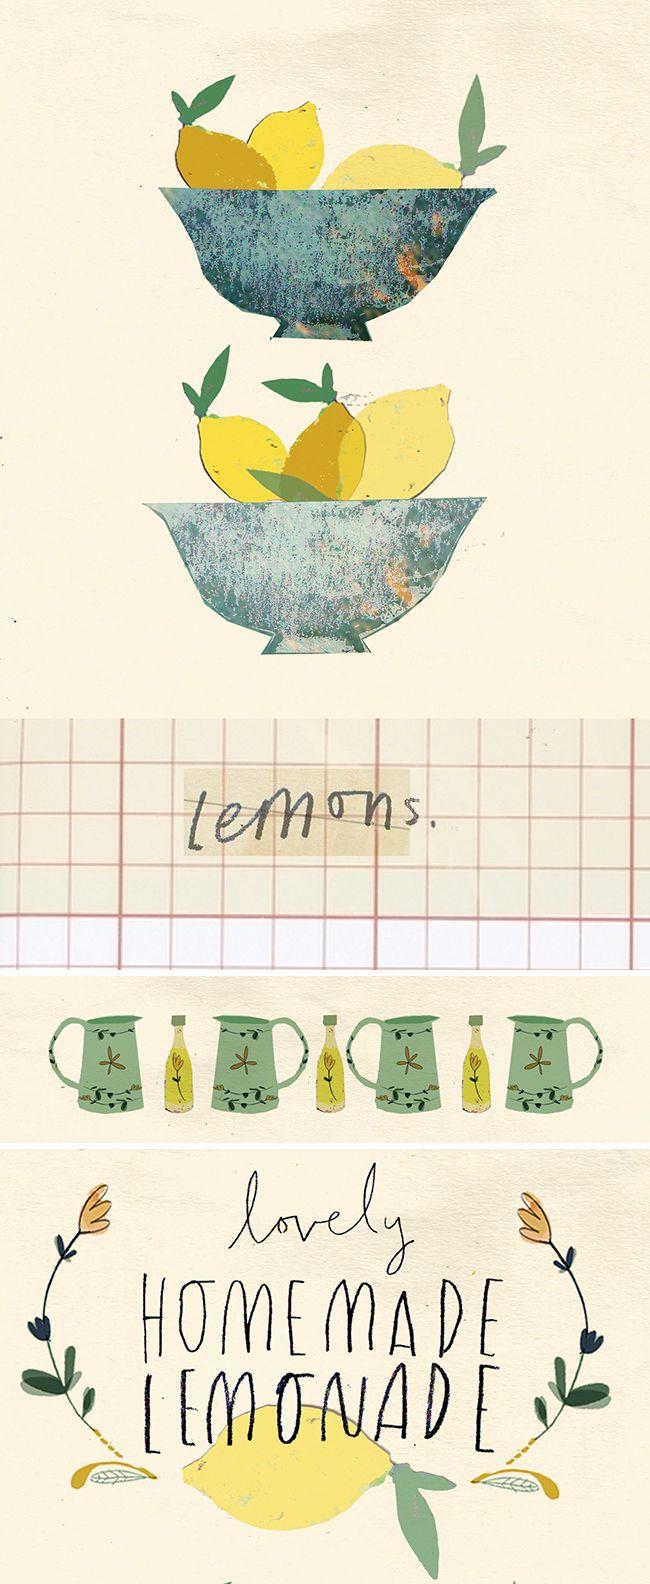 Clair Rossiter, lemonade, type, lemons, jug, illustration, print, drawing, wreath, sketch, pattern, colour